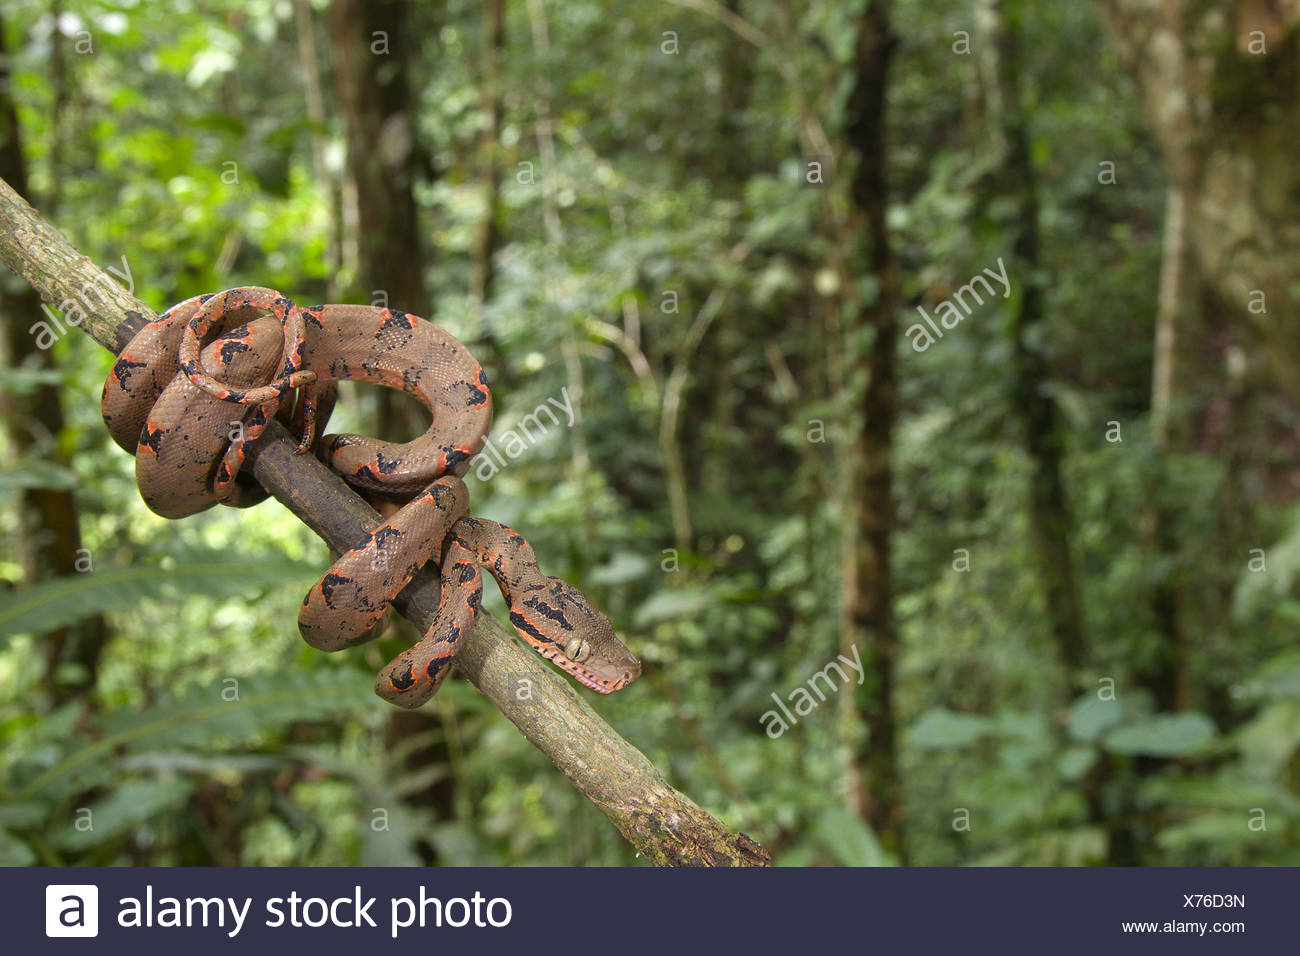 Amazon Tree Boa Corallus Enydris Stock Photos & Amazon Tree Boa ...